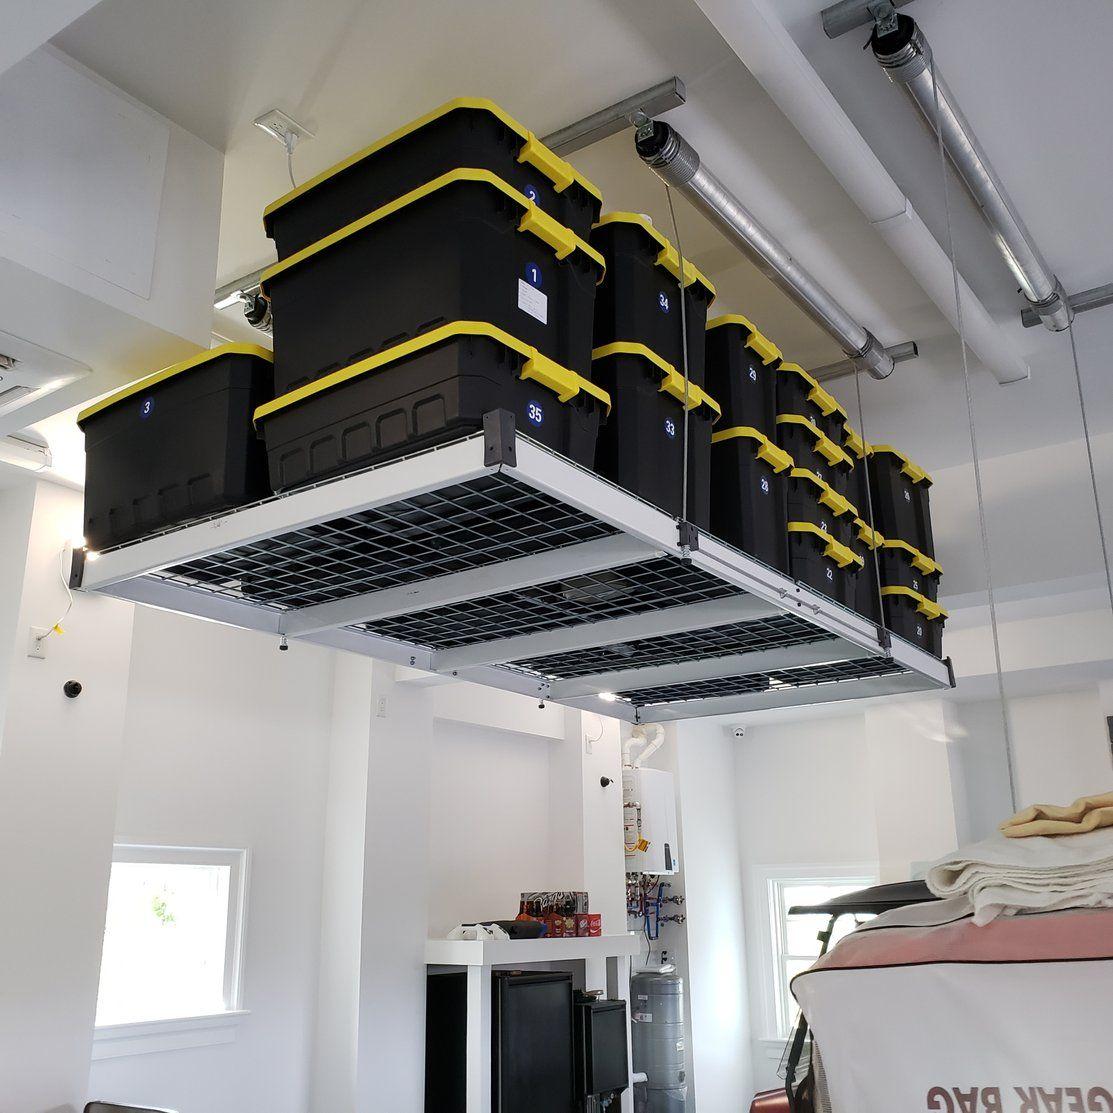 4x8 ft auxxlift premium 1400 400 lb garage storage